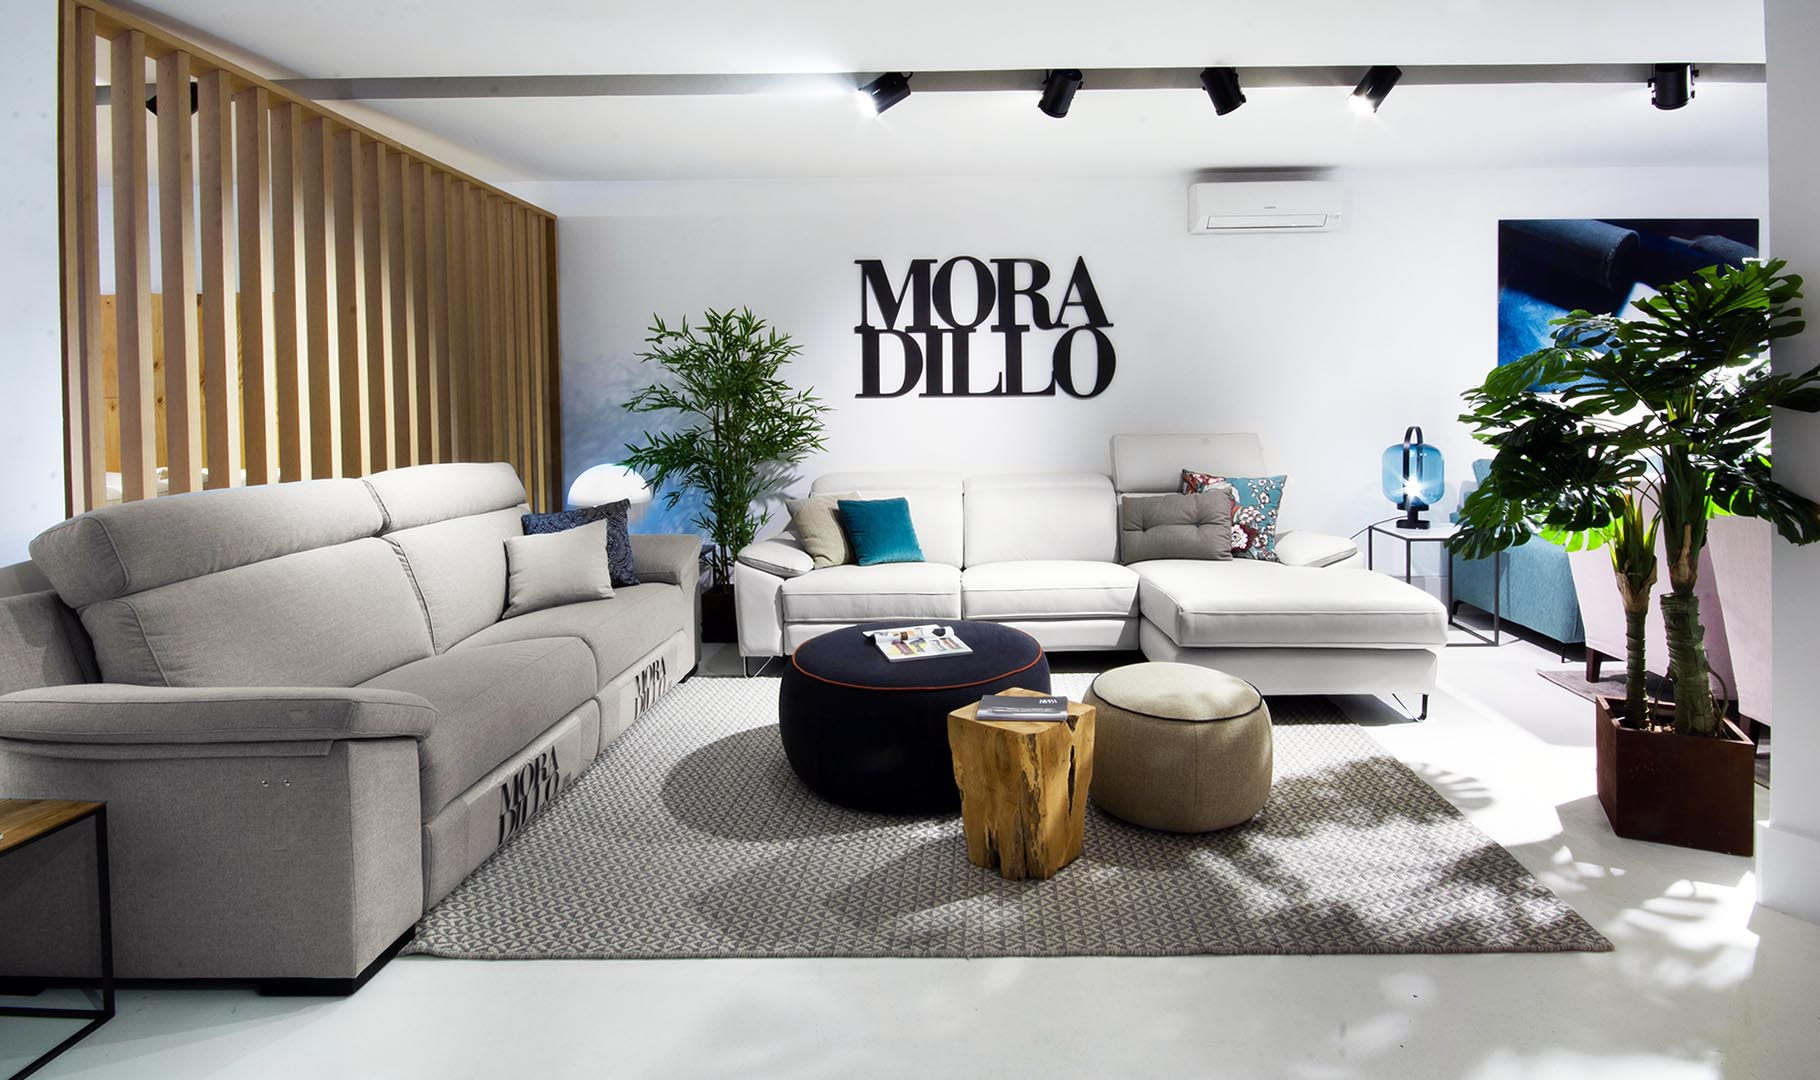 sofas moradillo black friday 2020